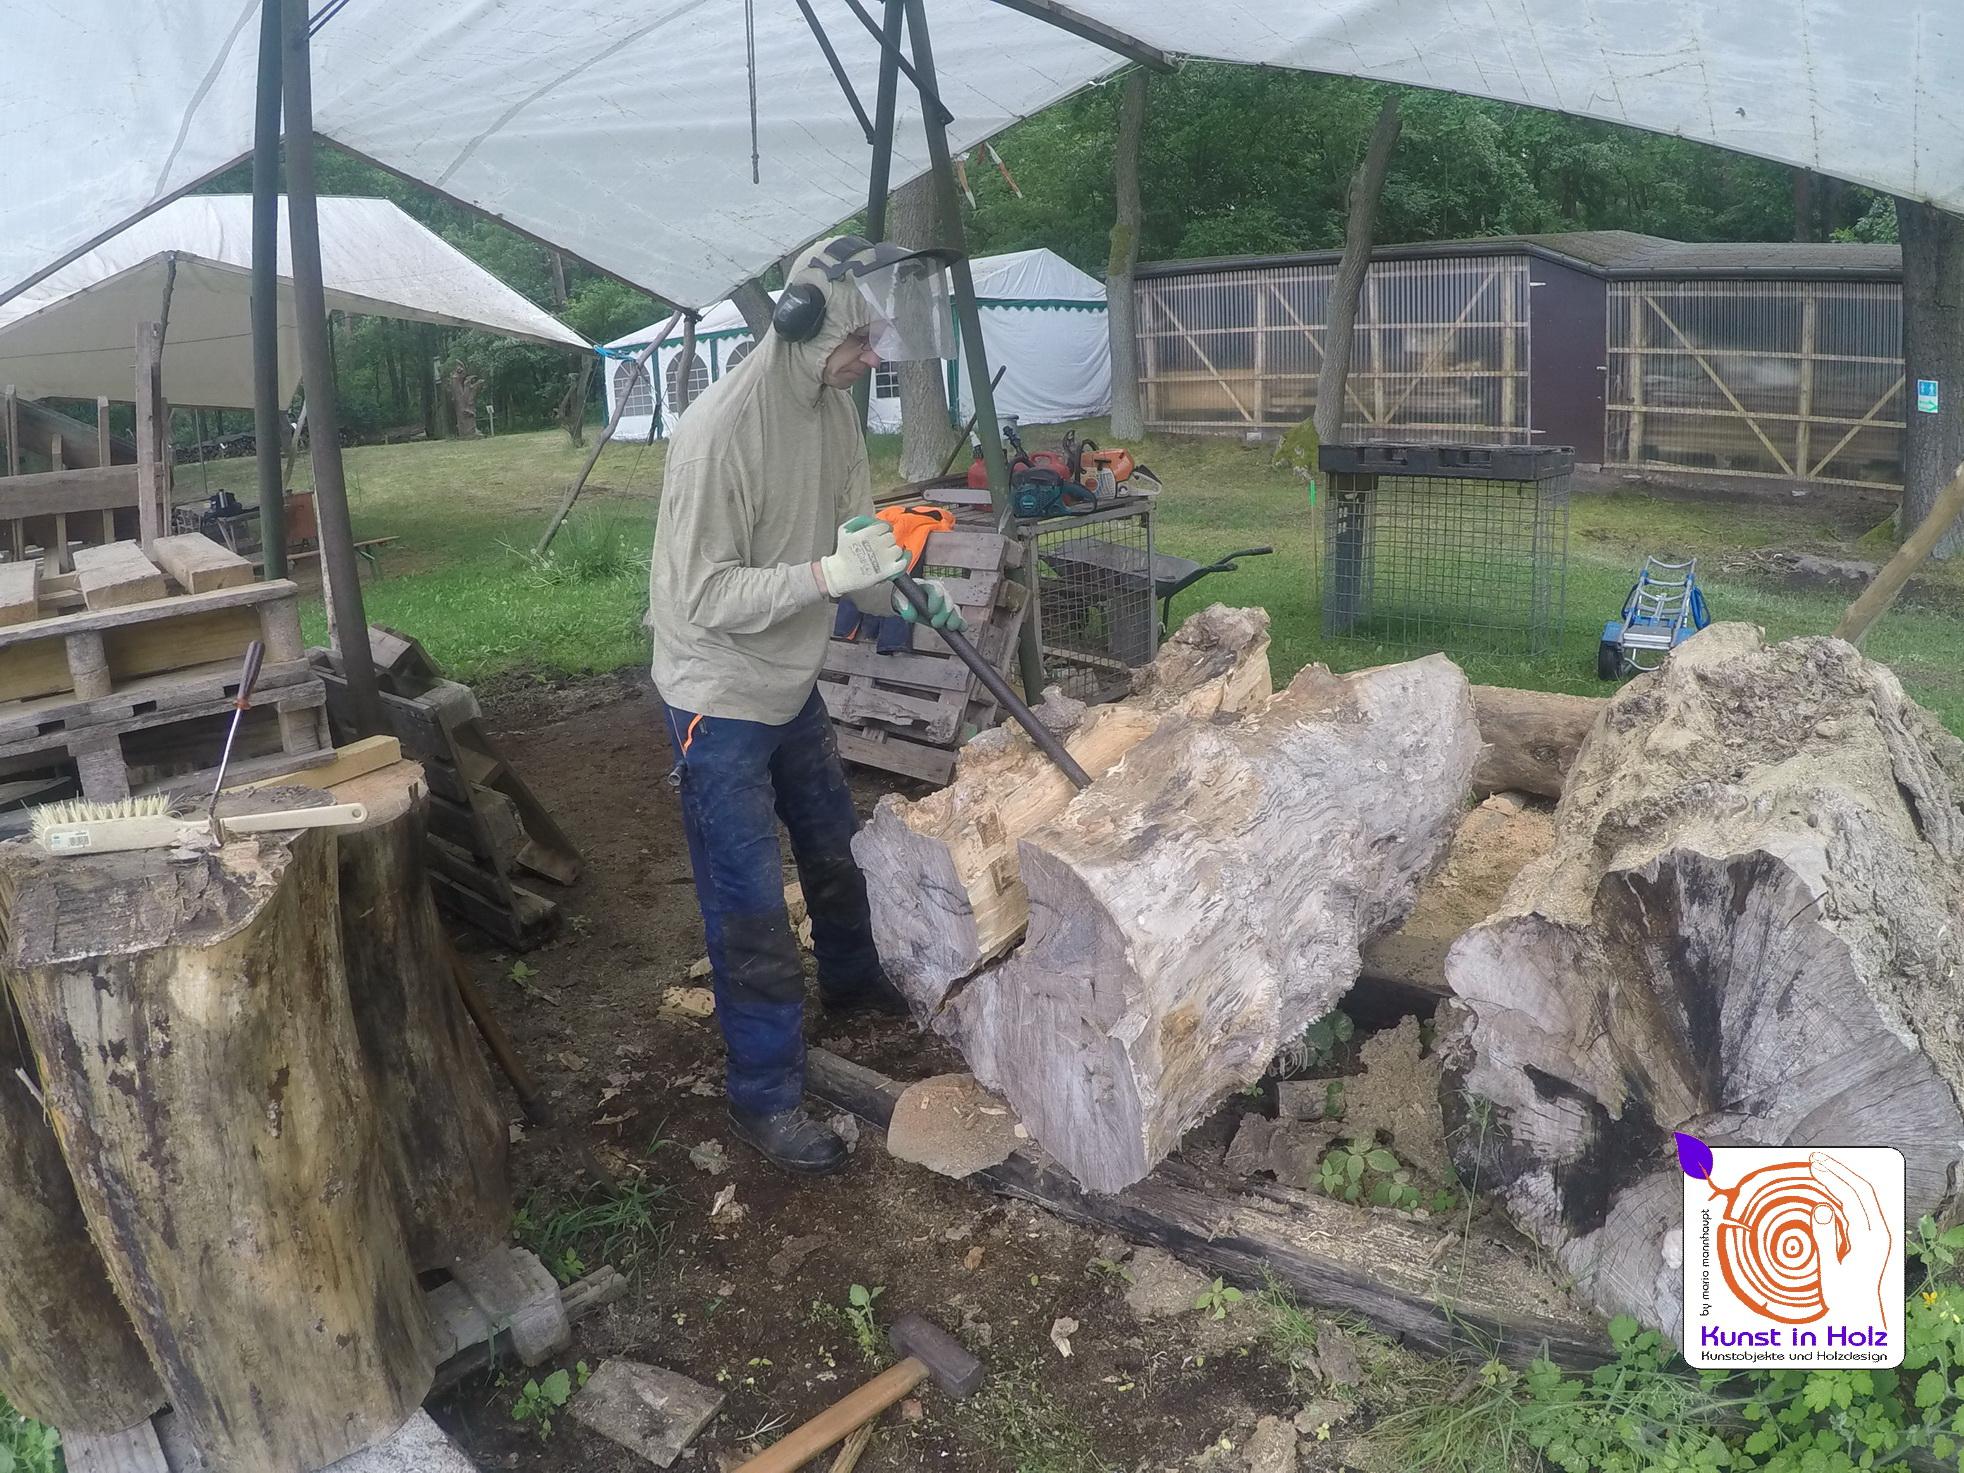 Entstehung der Holzskulptur umhuellt!